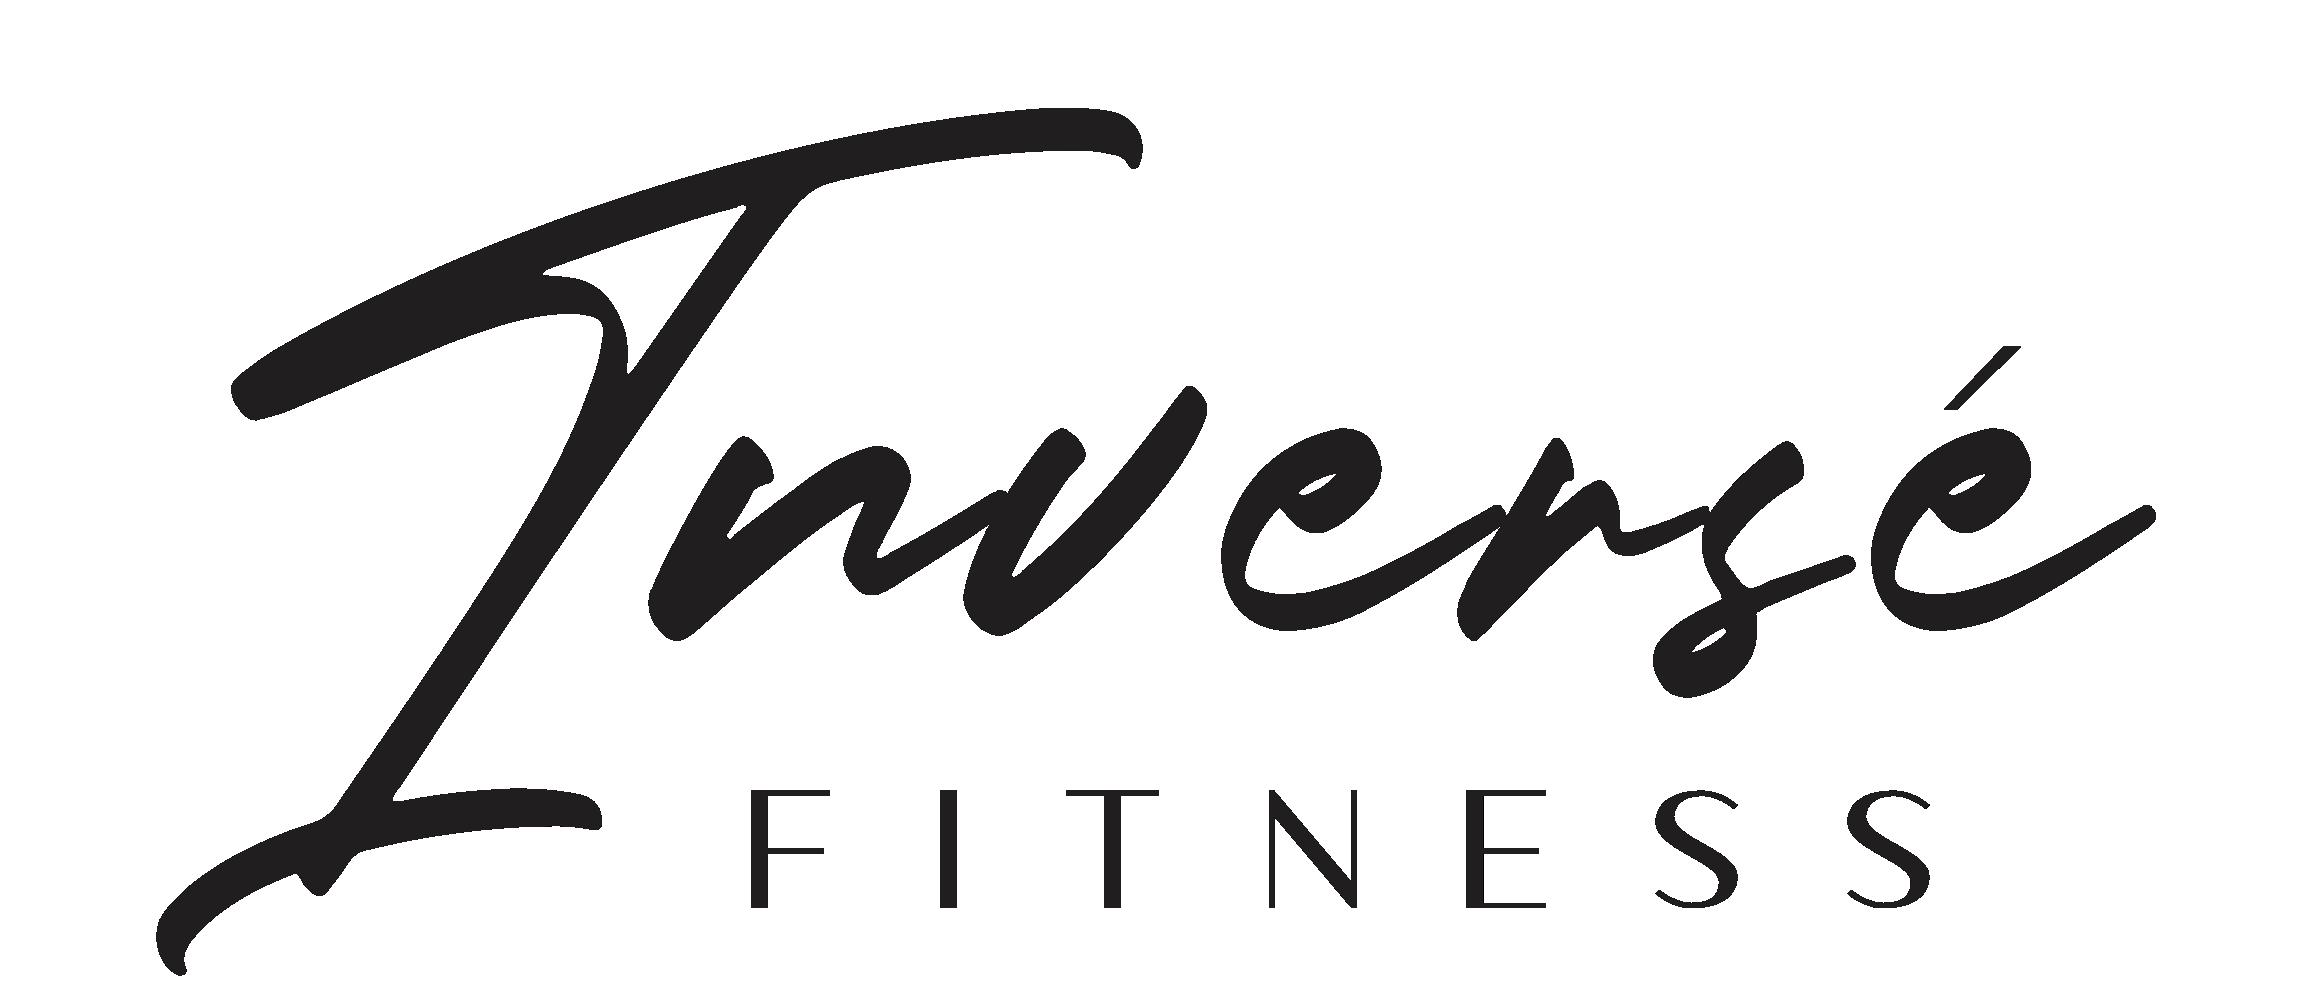 Inverse Fitness